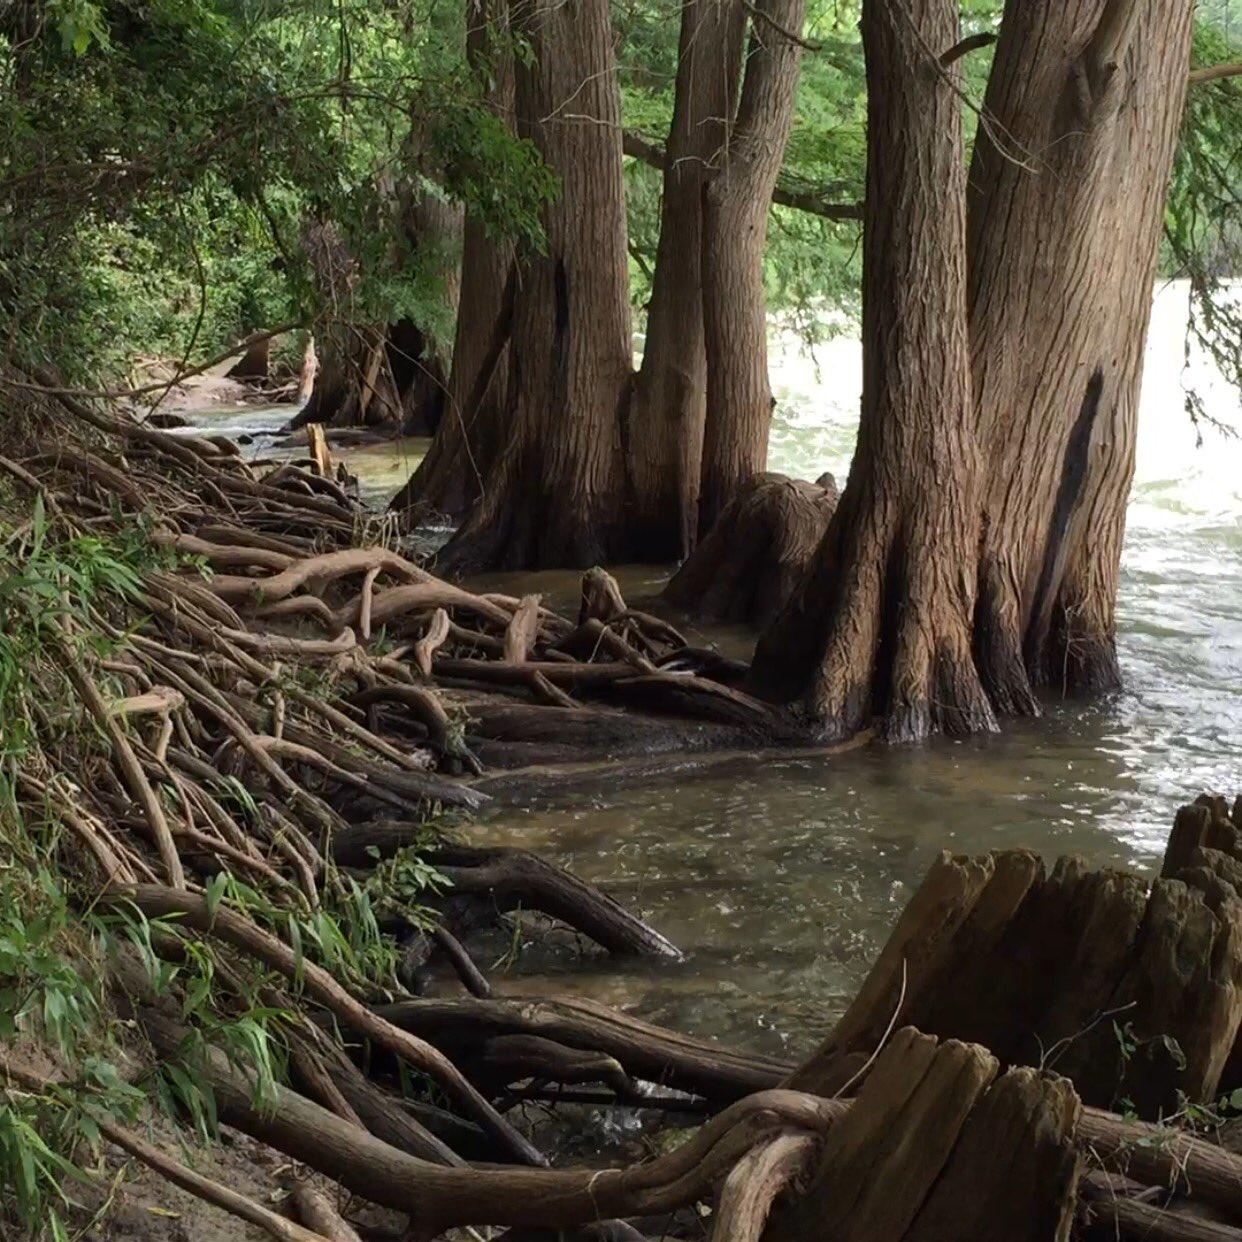 #Texas #hillcountry   #guadaluperiver   #nature #wilderness #yogi #love https://t.co/acWTN2dnCY